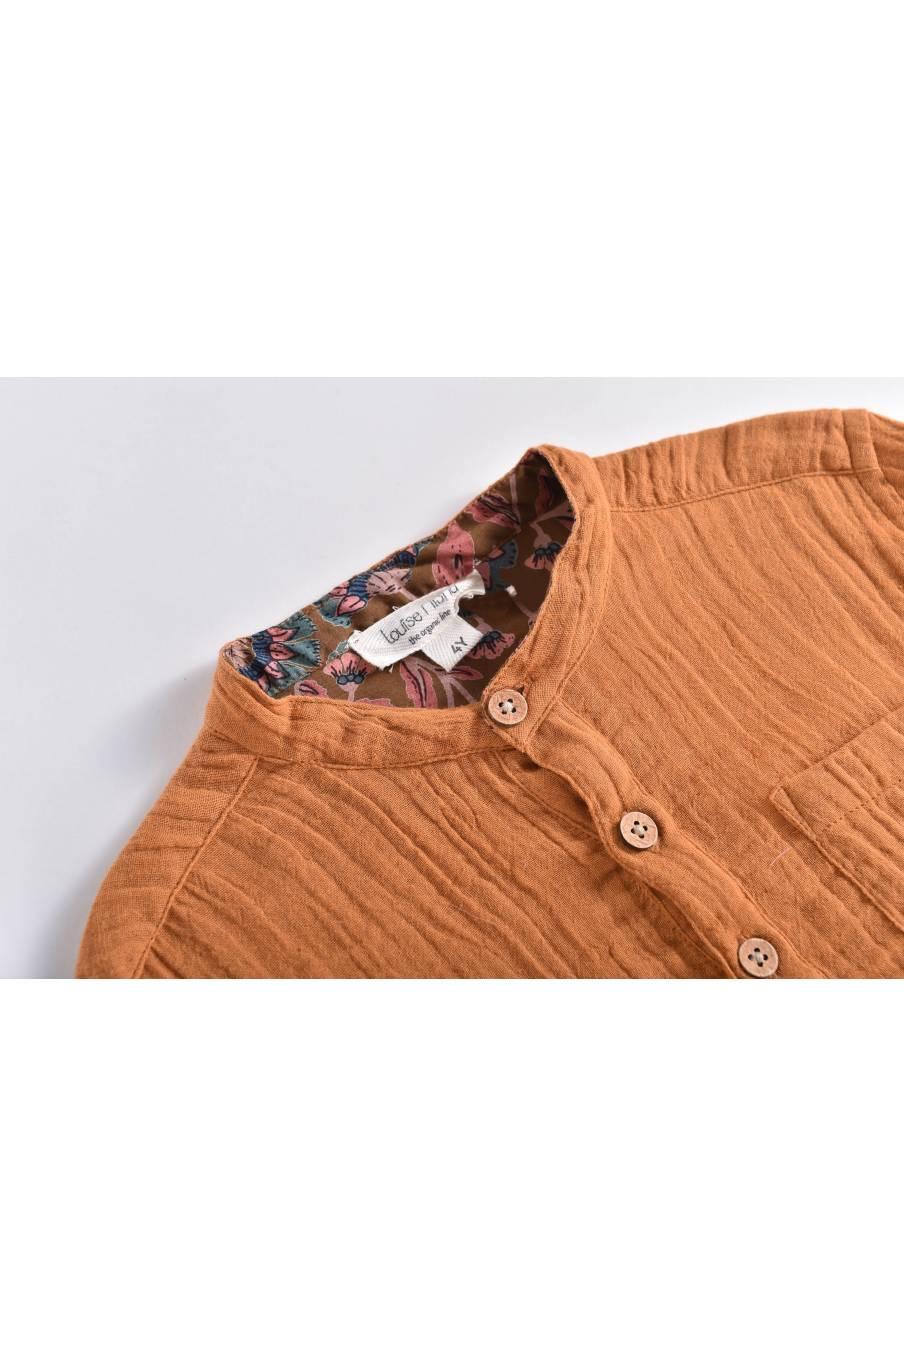 boheme chic vintage chemise bébé garcon aman dark safran